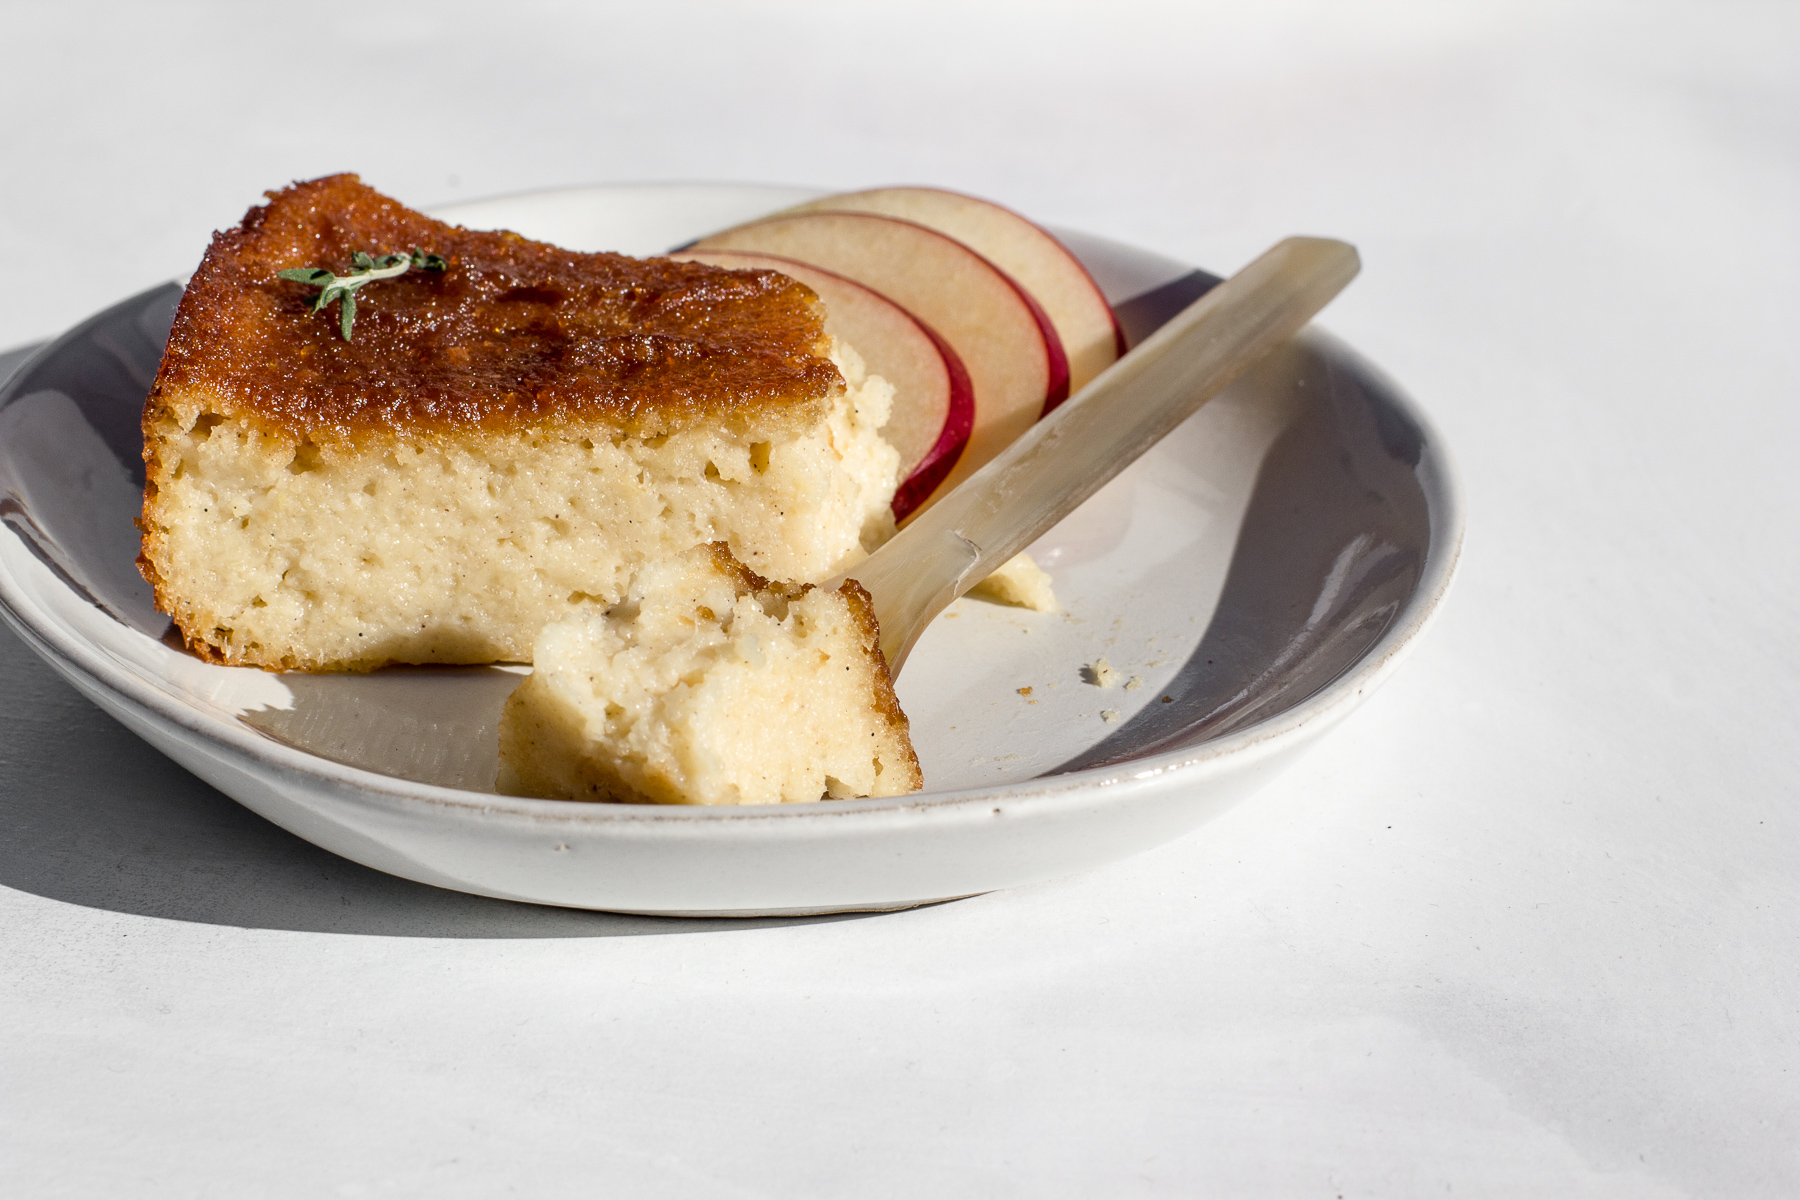 cassava cake with apple sauce